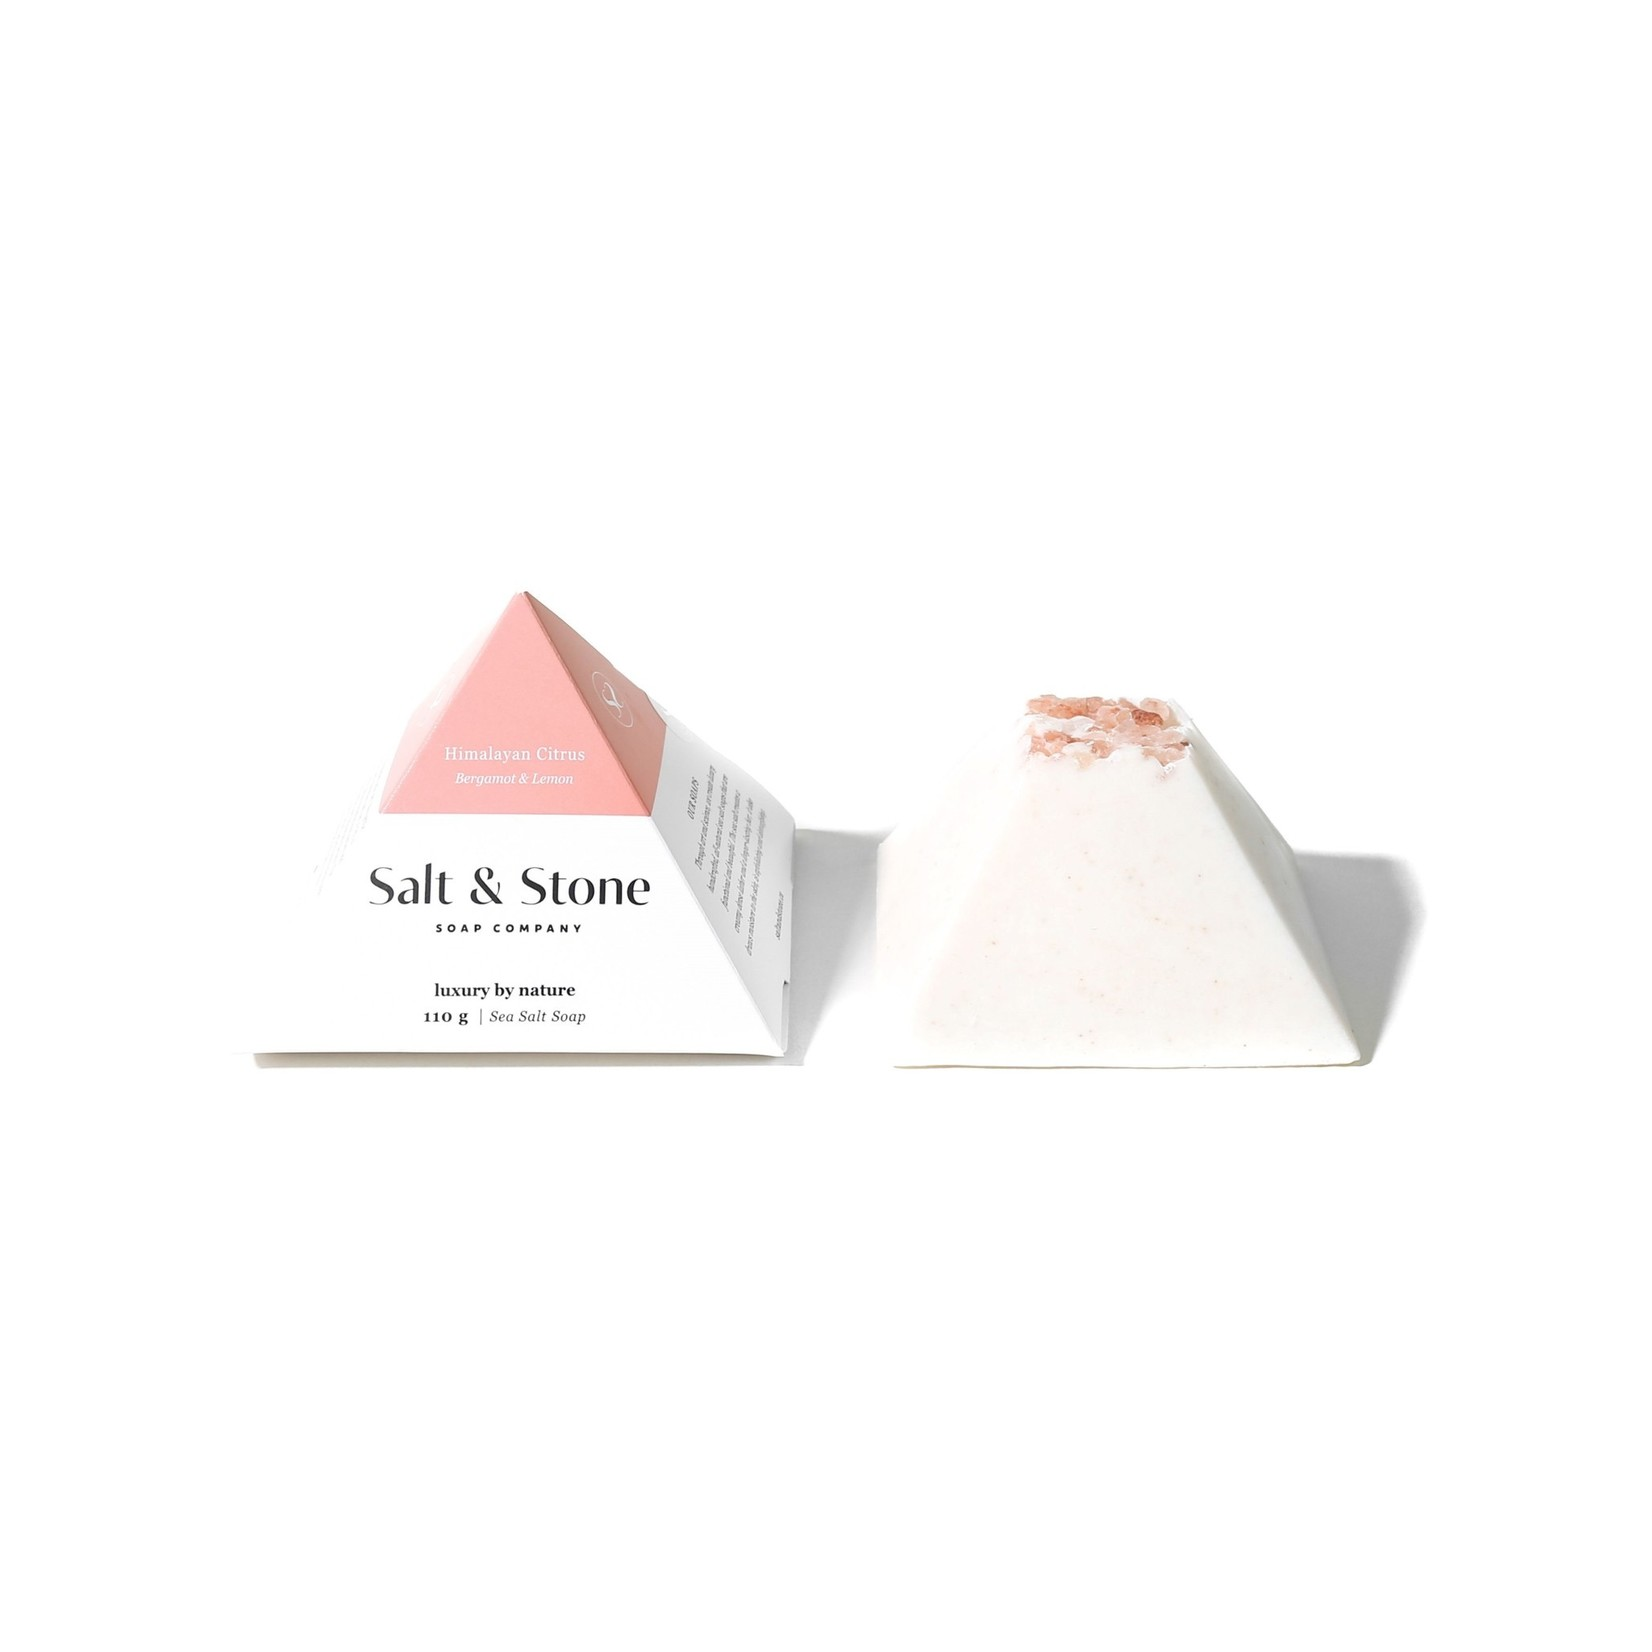 SALT AND STONE COMPANY Himalayan Citrus Sea Salt Soap